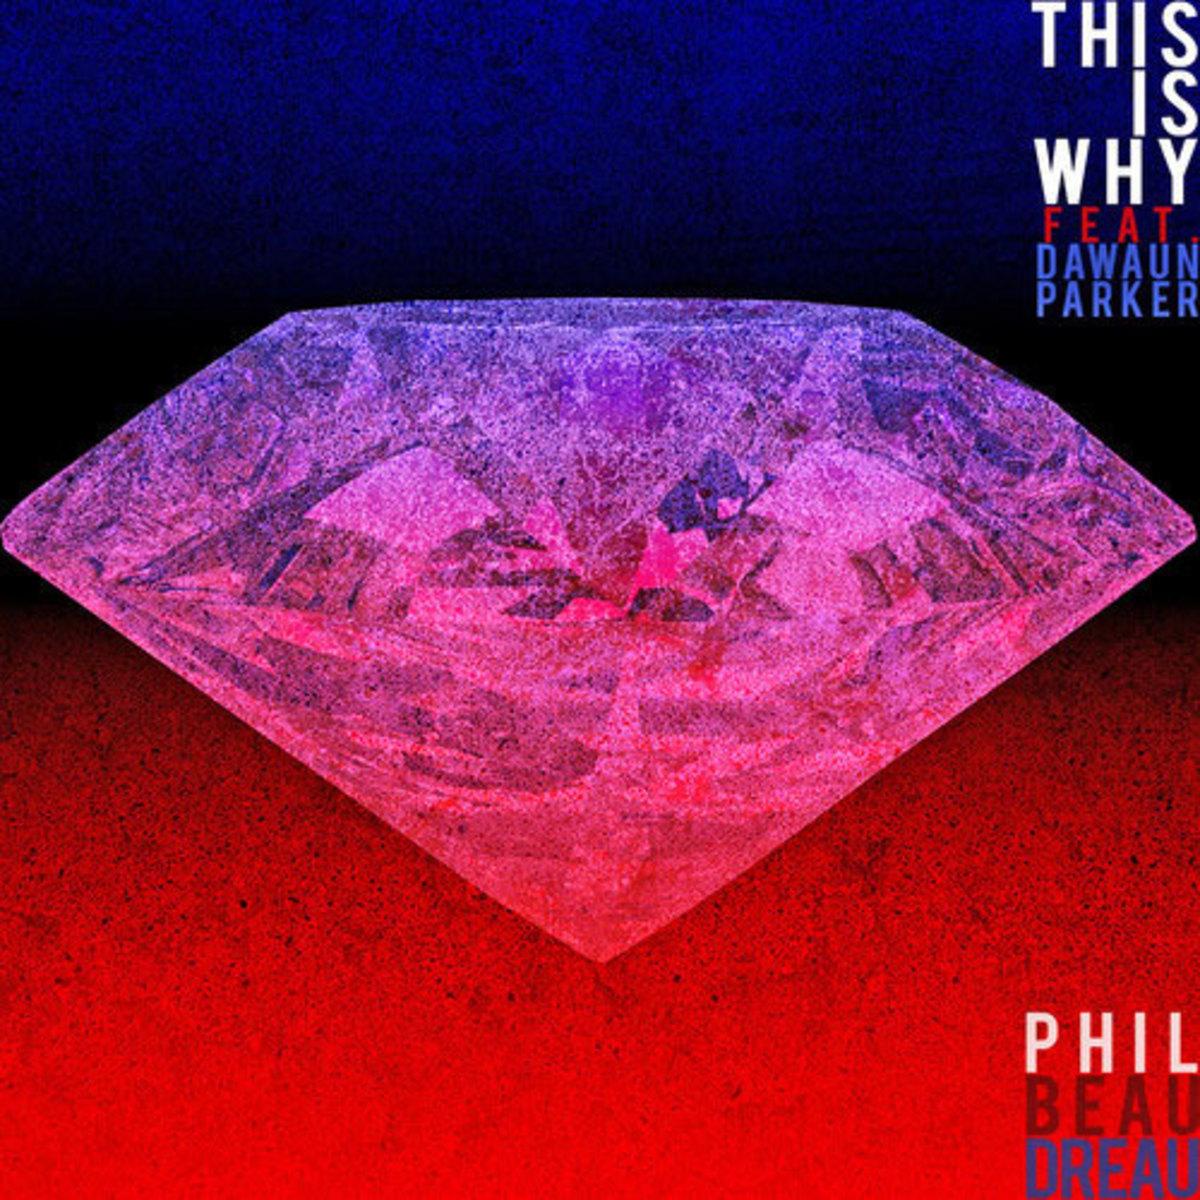 philb-thisiswhy.jpg